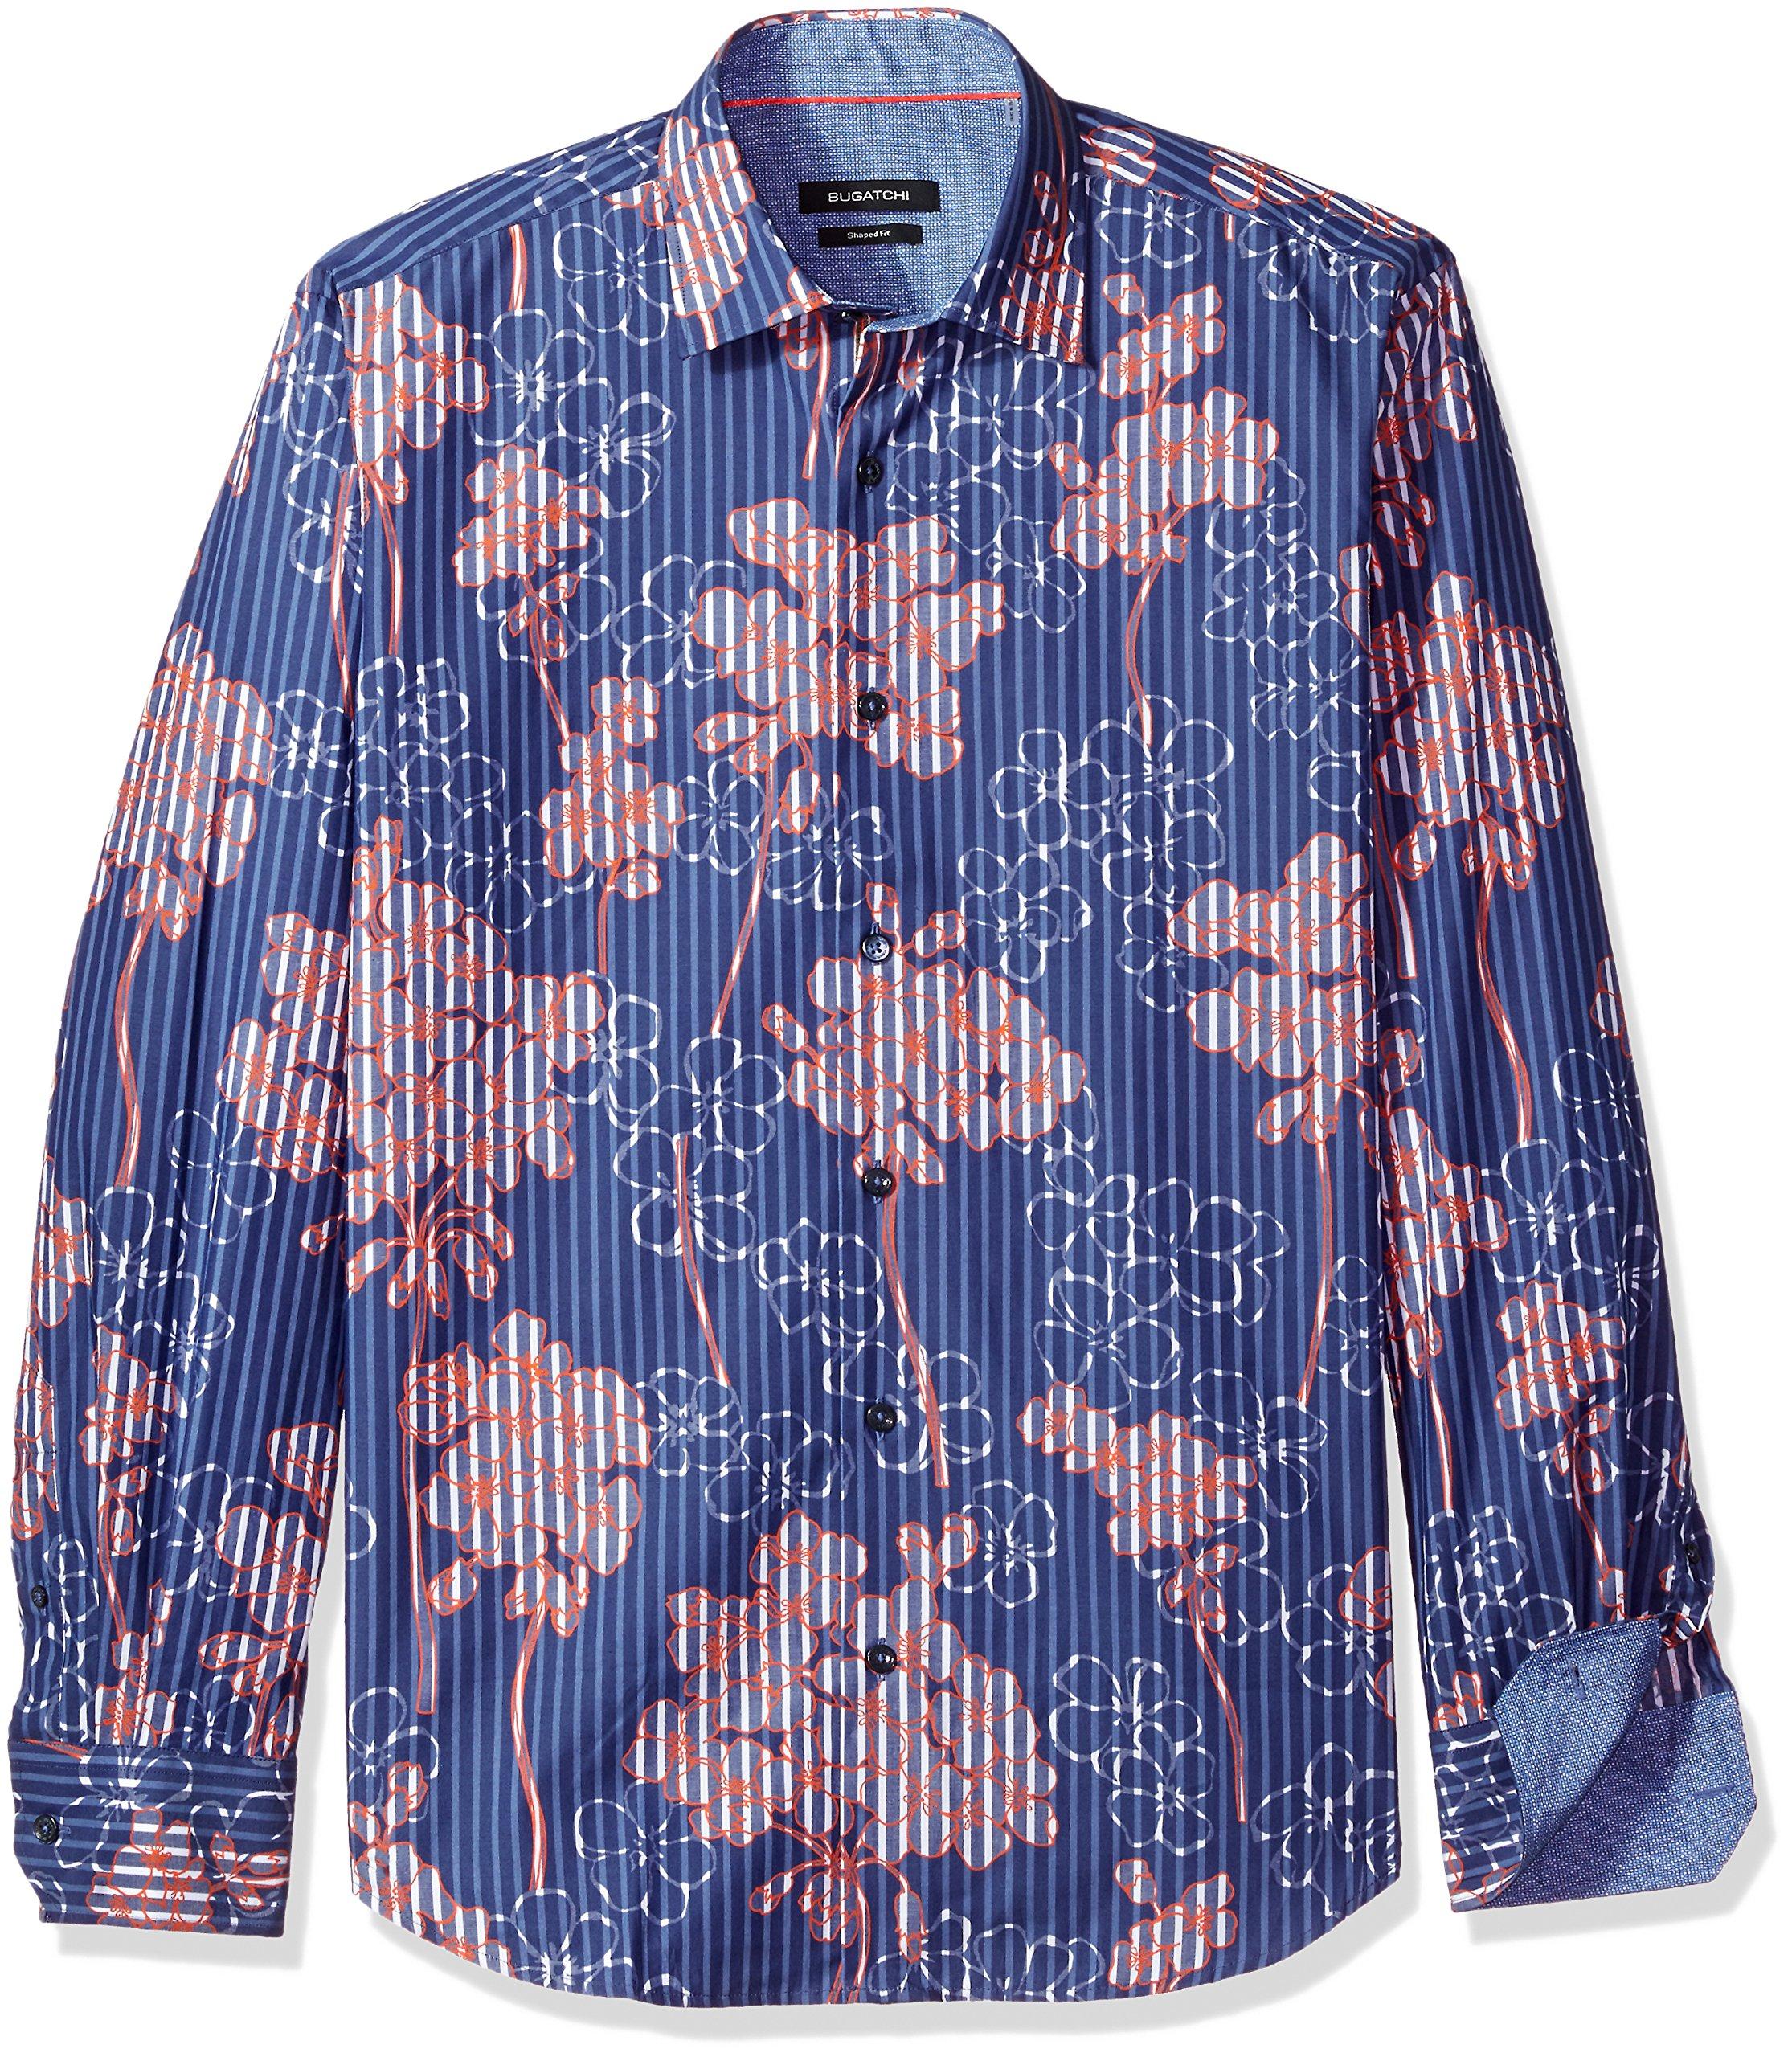 Bugatchi Men's Cotton Slim Fit French Placket Shirt, Navy, Large by Bugatchi (Image #1)